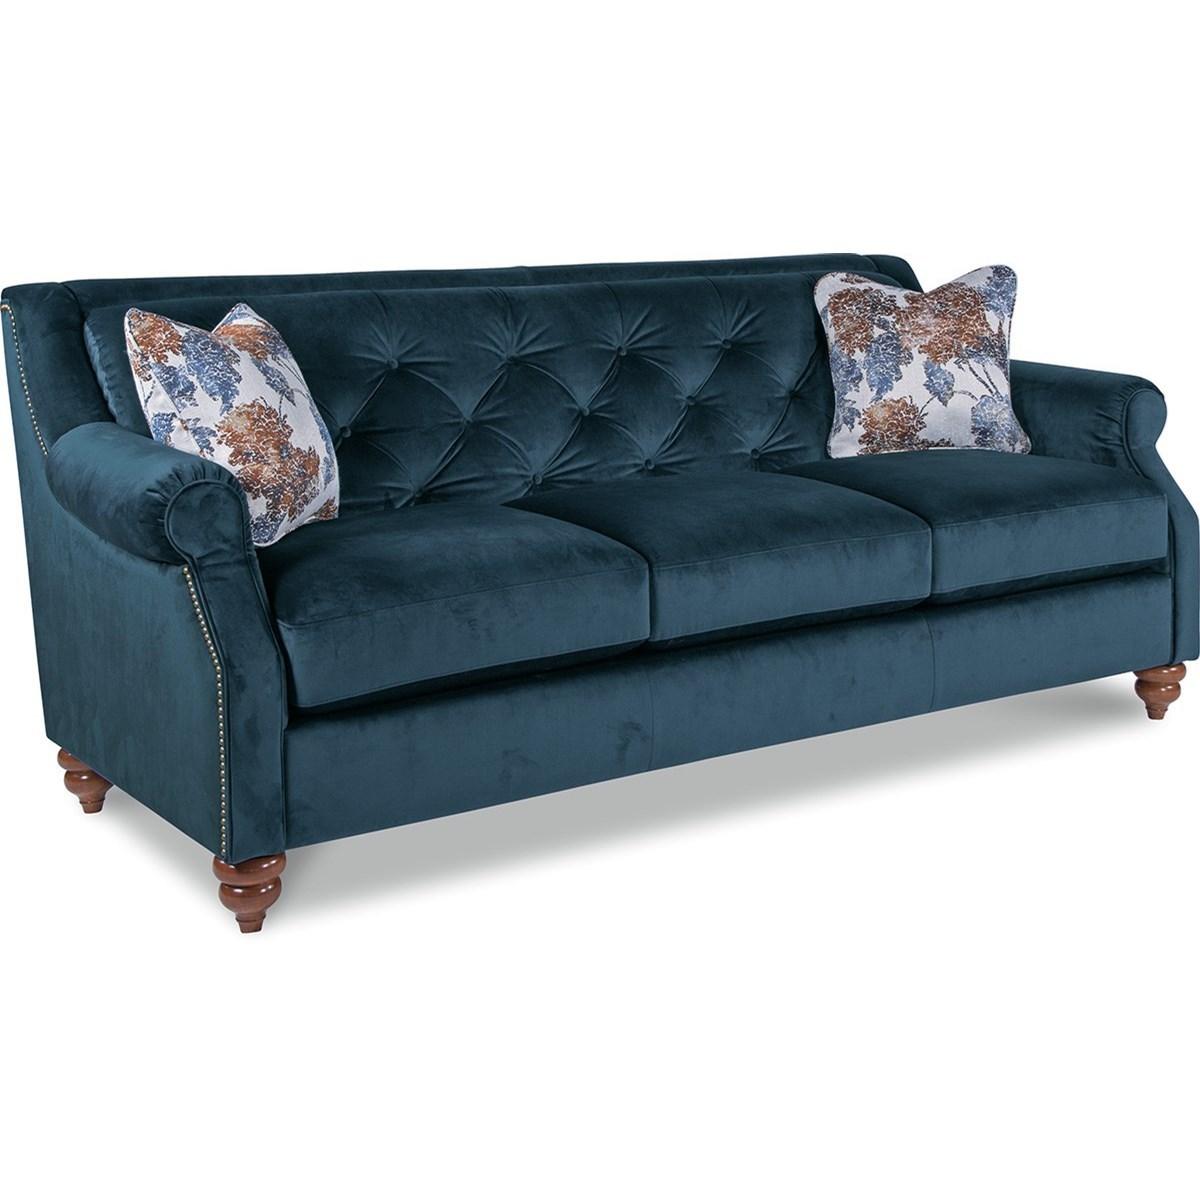 La Z Boy Aberdeen Traditional Sofa With Tufted Seatback